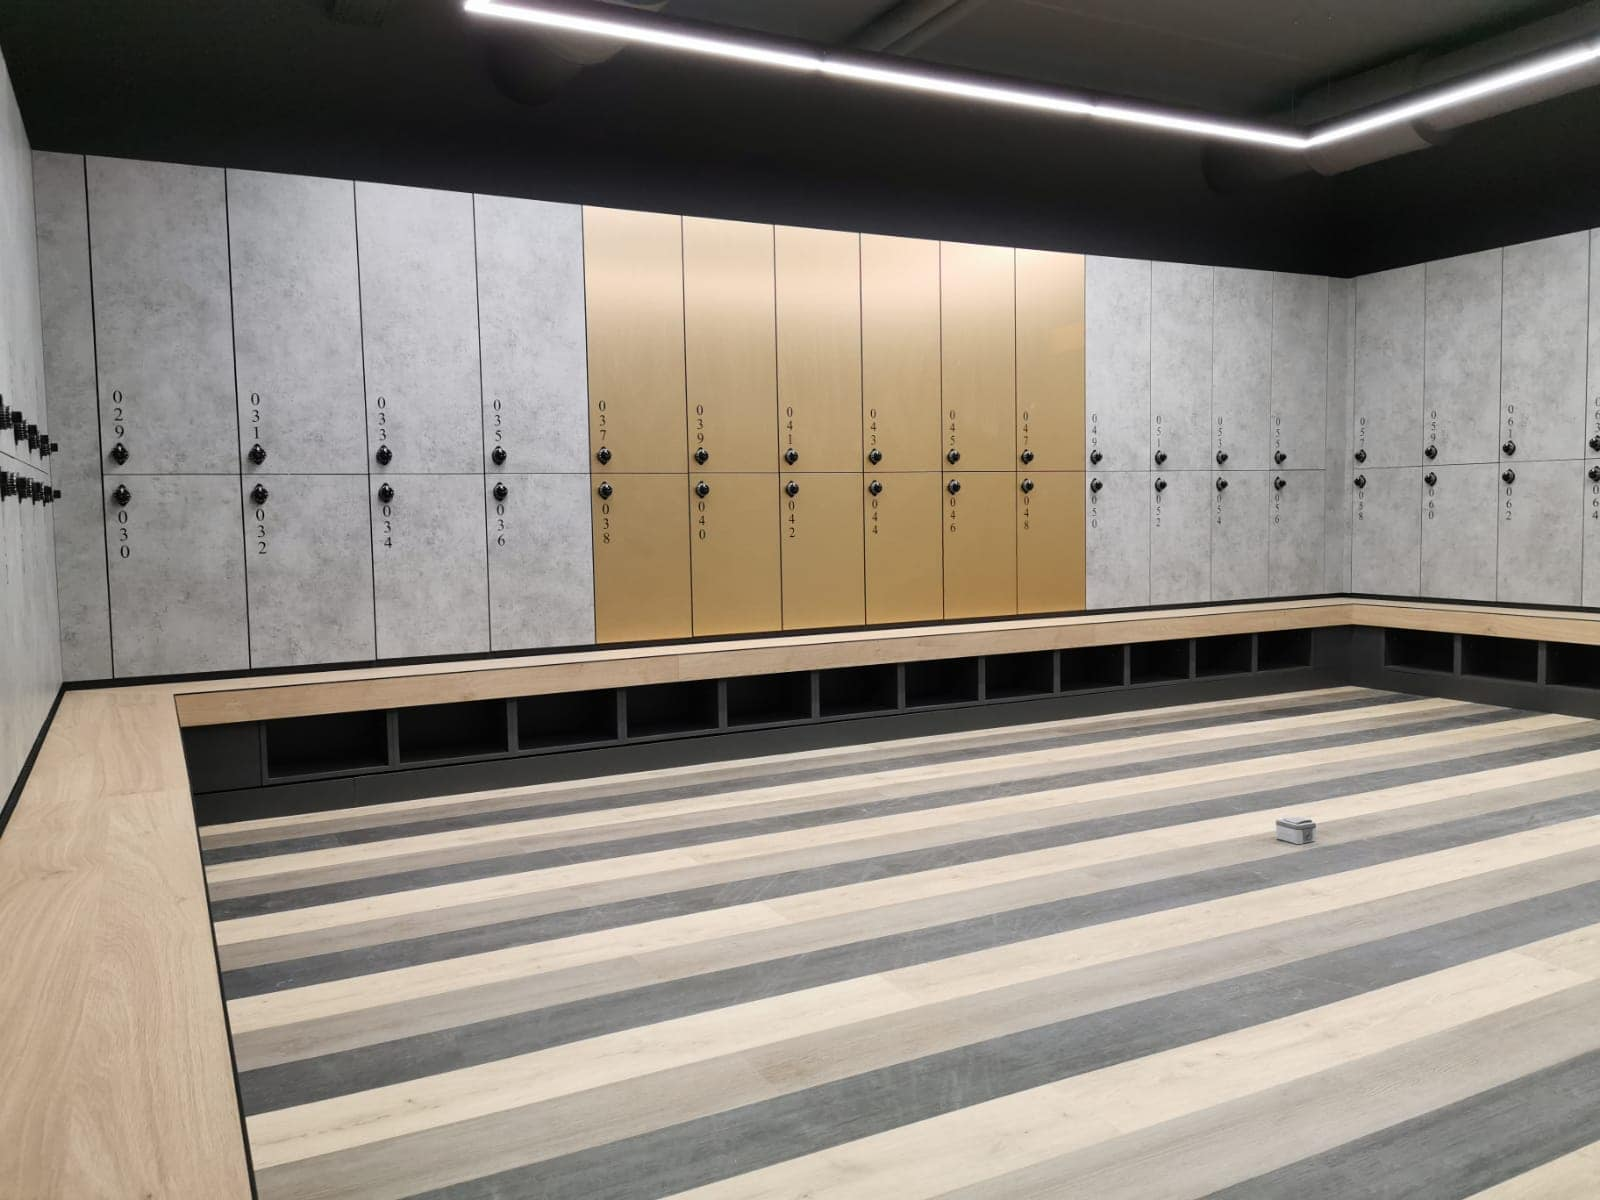 locker room lockers with bench